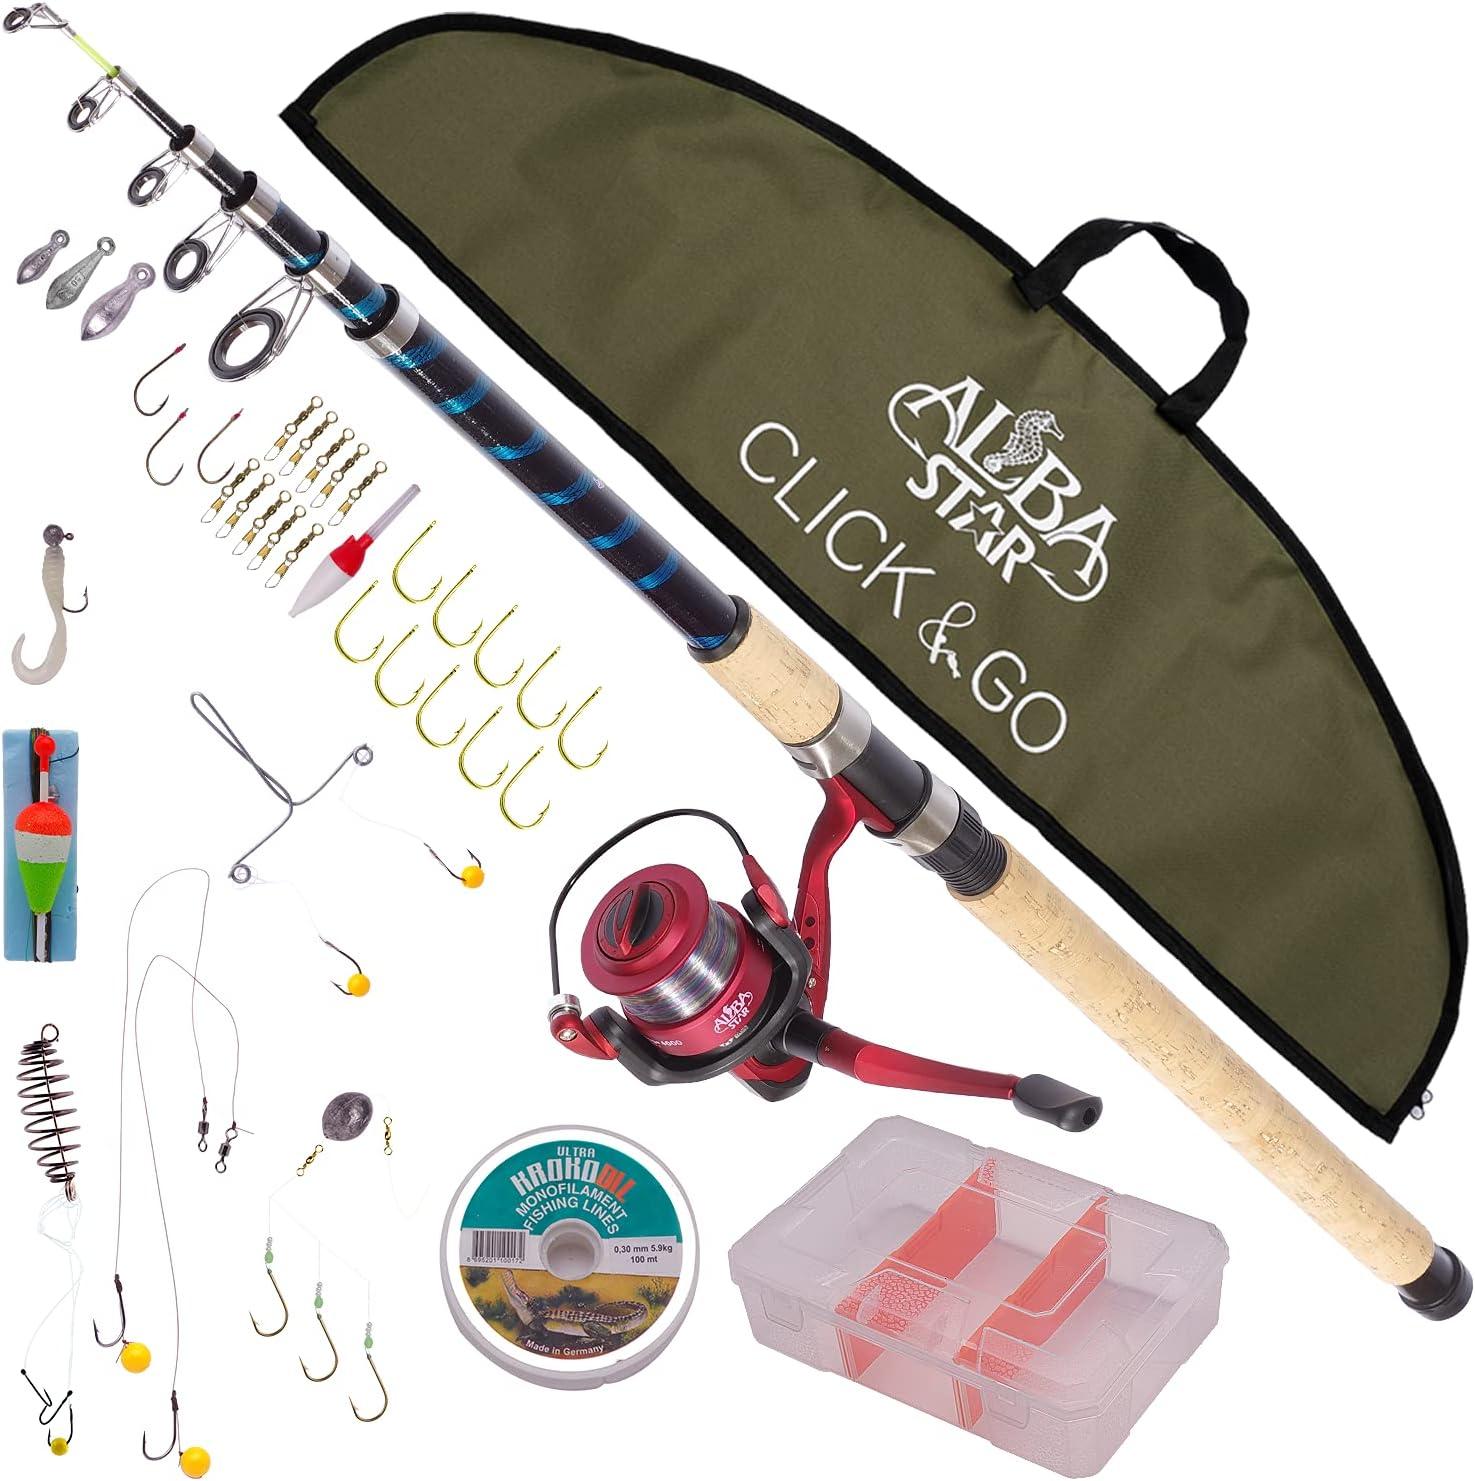 Alba Topics on TV Star Arlington Mall Click Go Professional Fishing Rod and Combo Set Reel